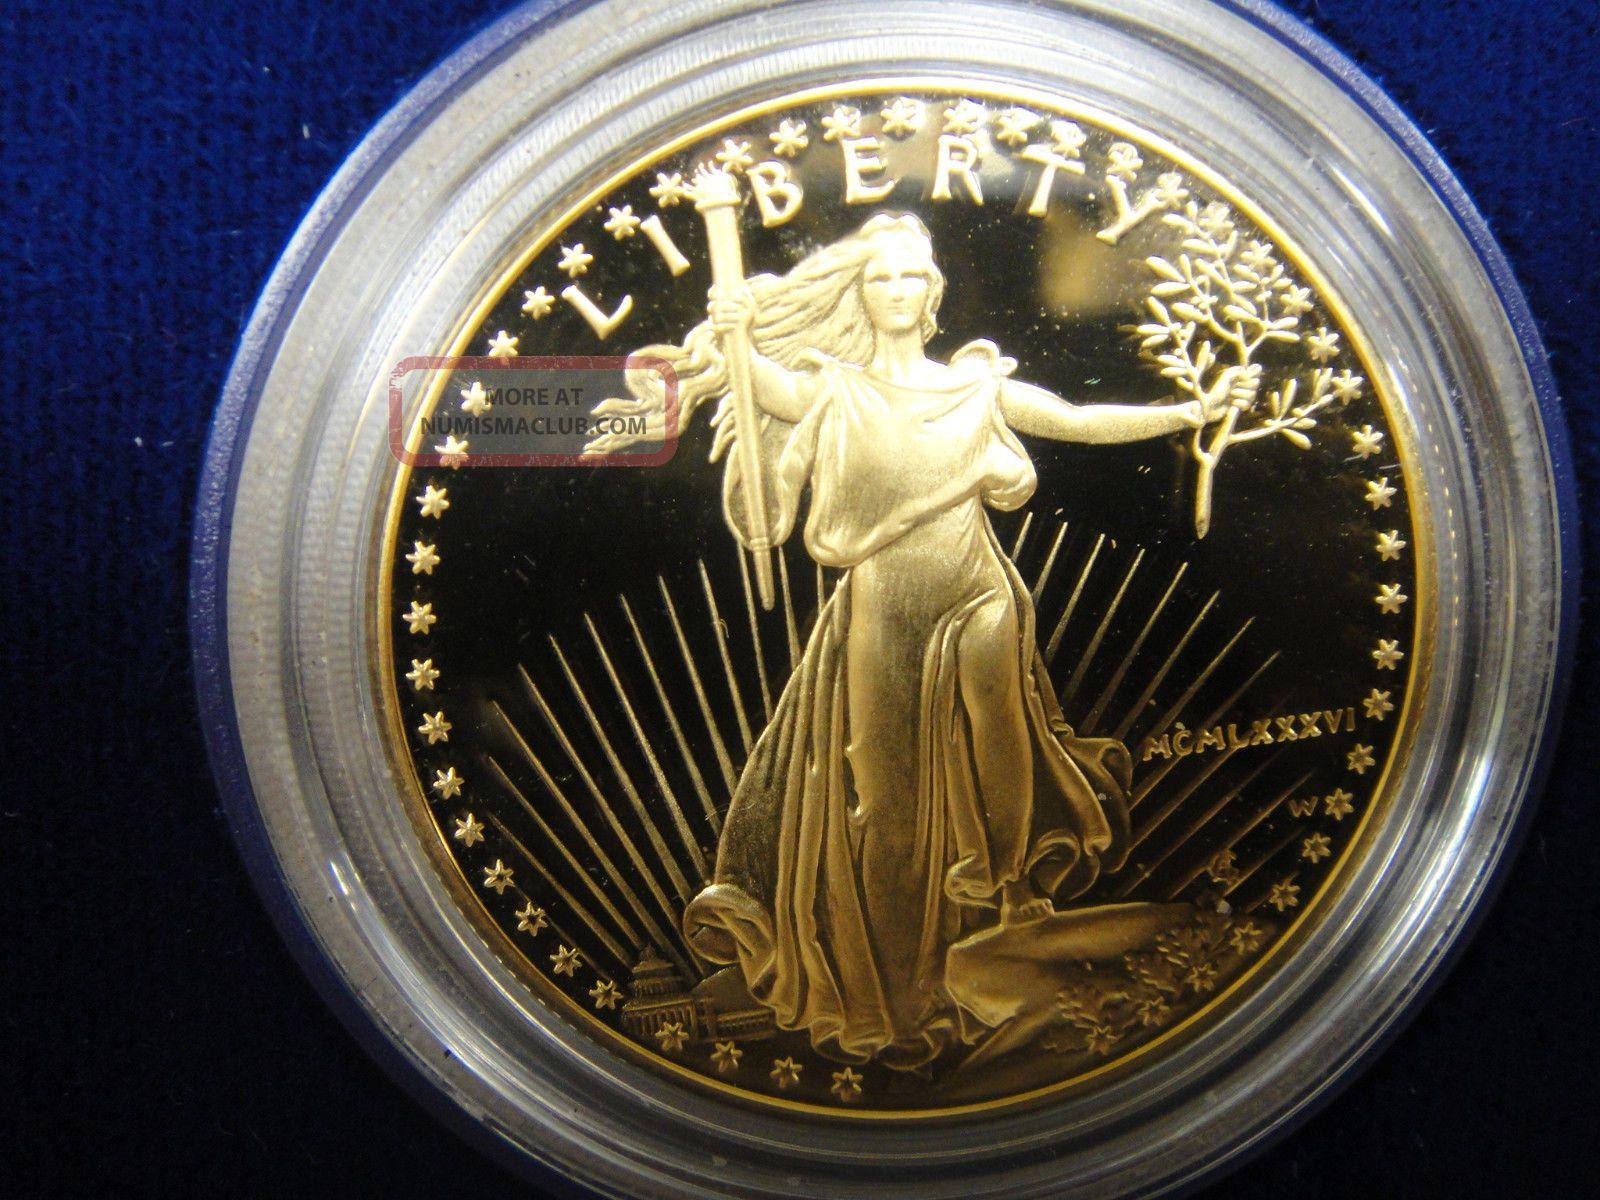 American Eagle One Ounce 1 Oz Proof Gold Bullion Coin